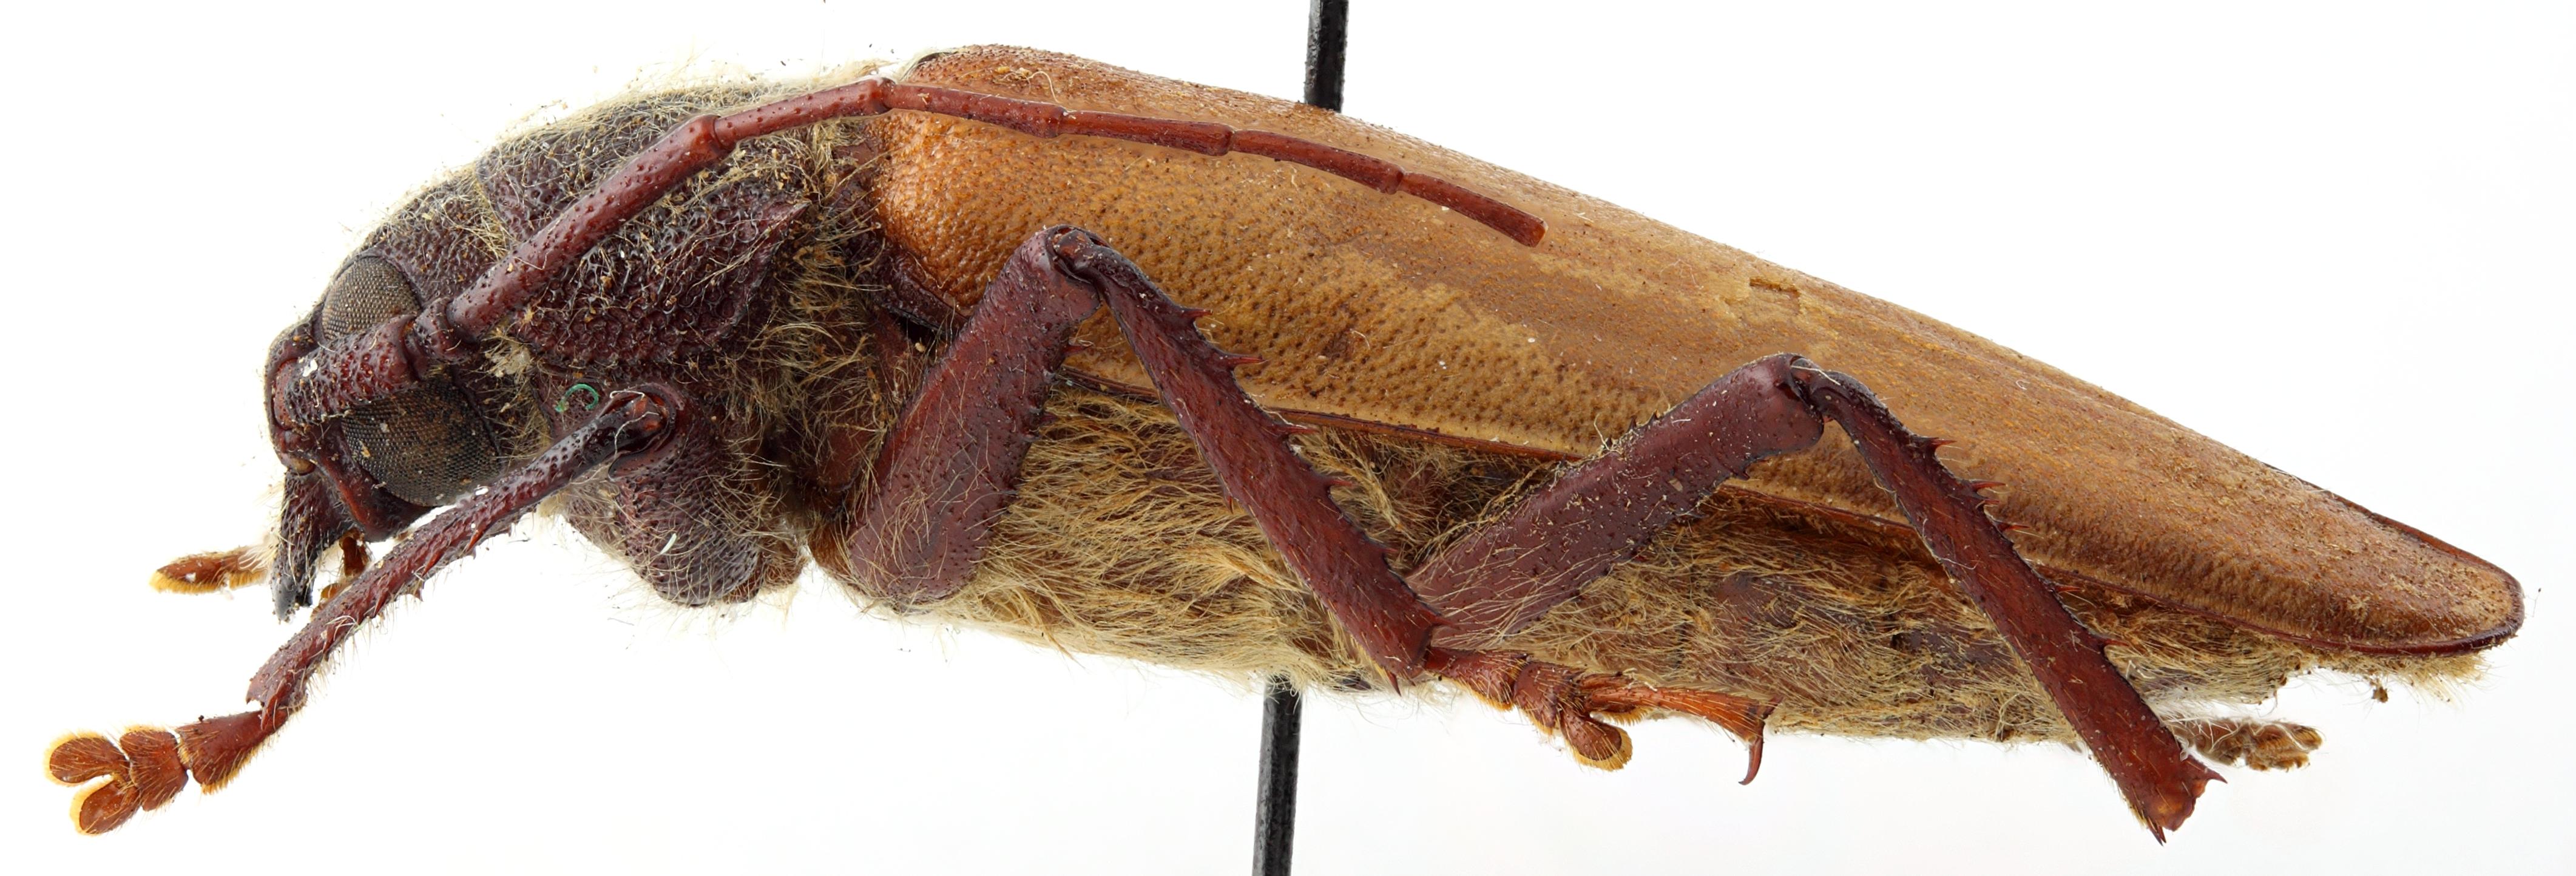 Hovatoma collarti 04 BL Holotype M 035 BRUS 201405.jpg